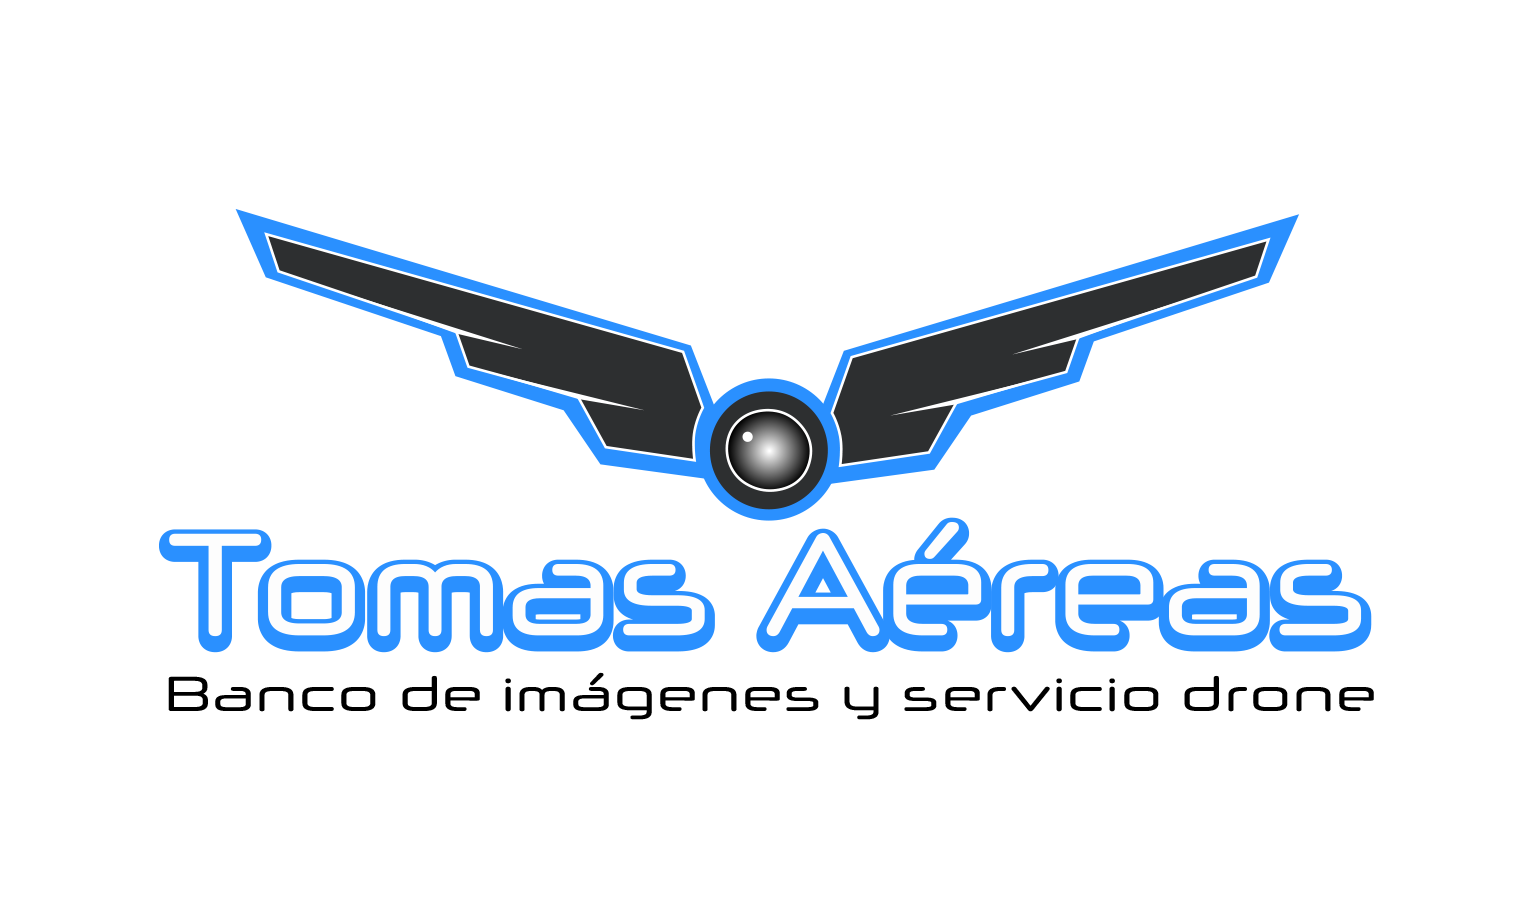 Tomas Aereas